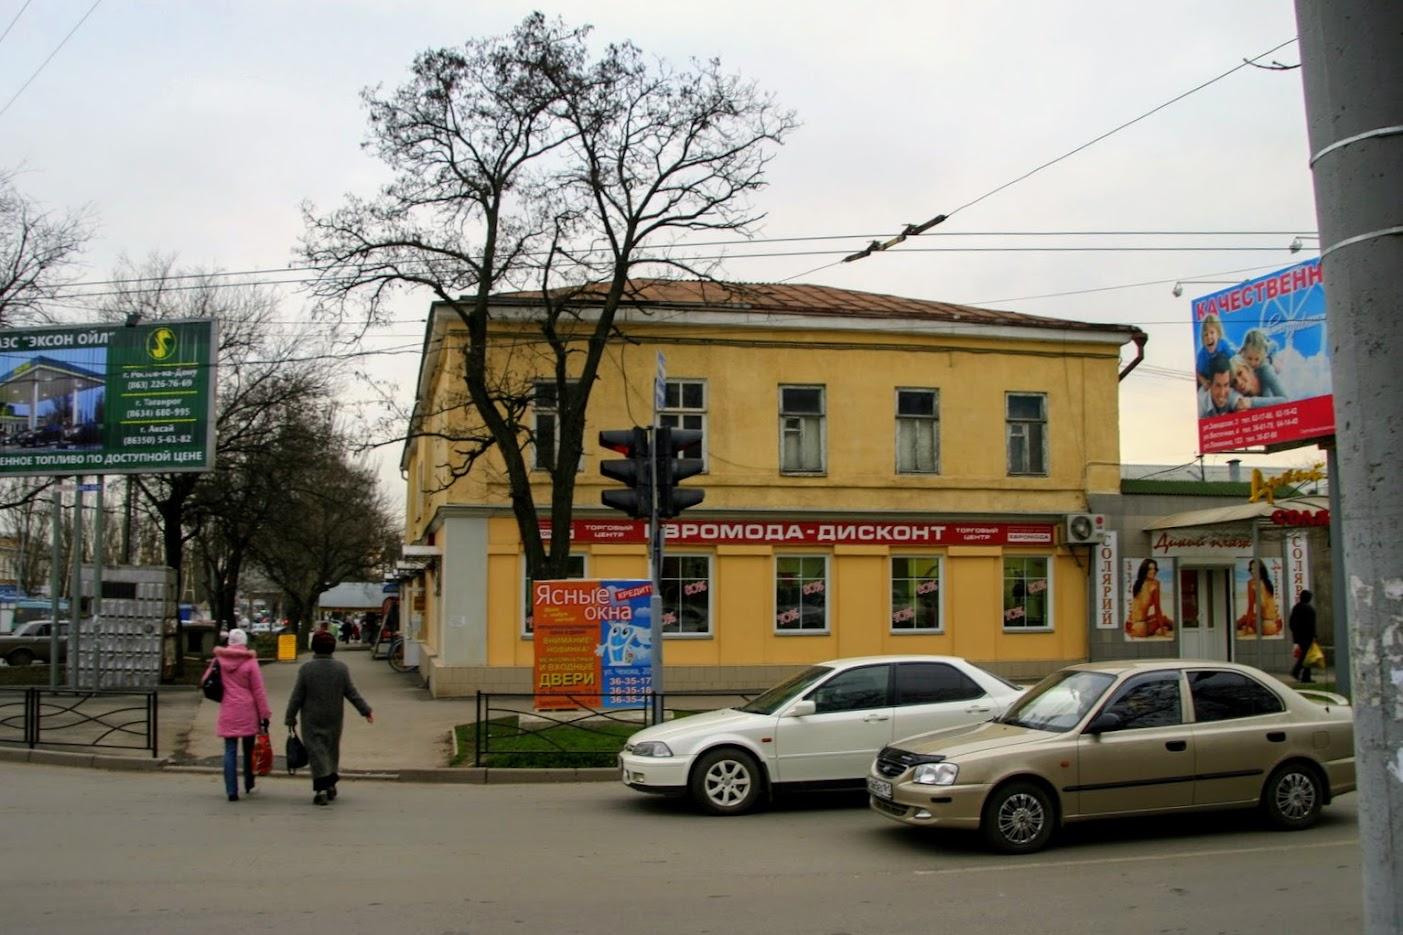 https://sites.google.com/site/istoriceskijtaganrog/gogolevskij-pereulok/dom-14